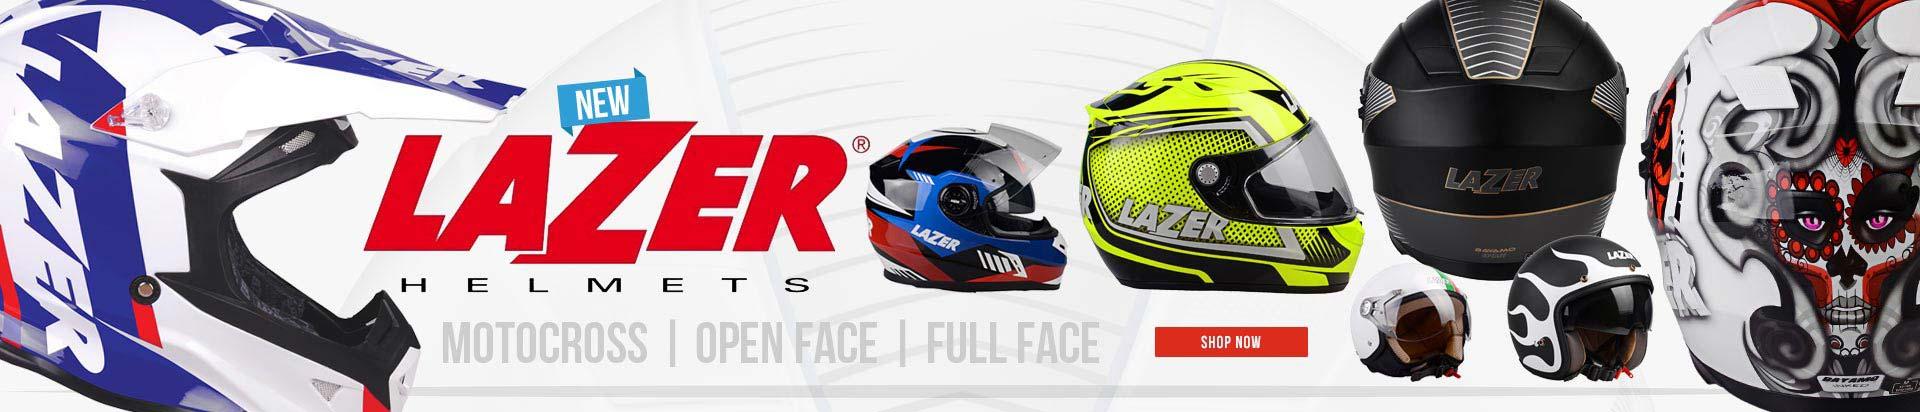 Lazer Helmets